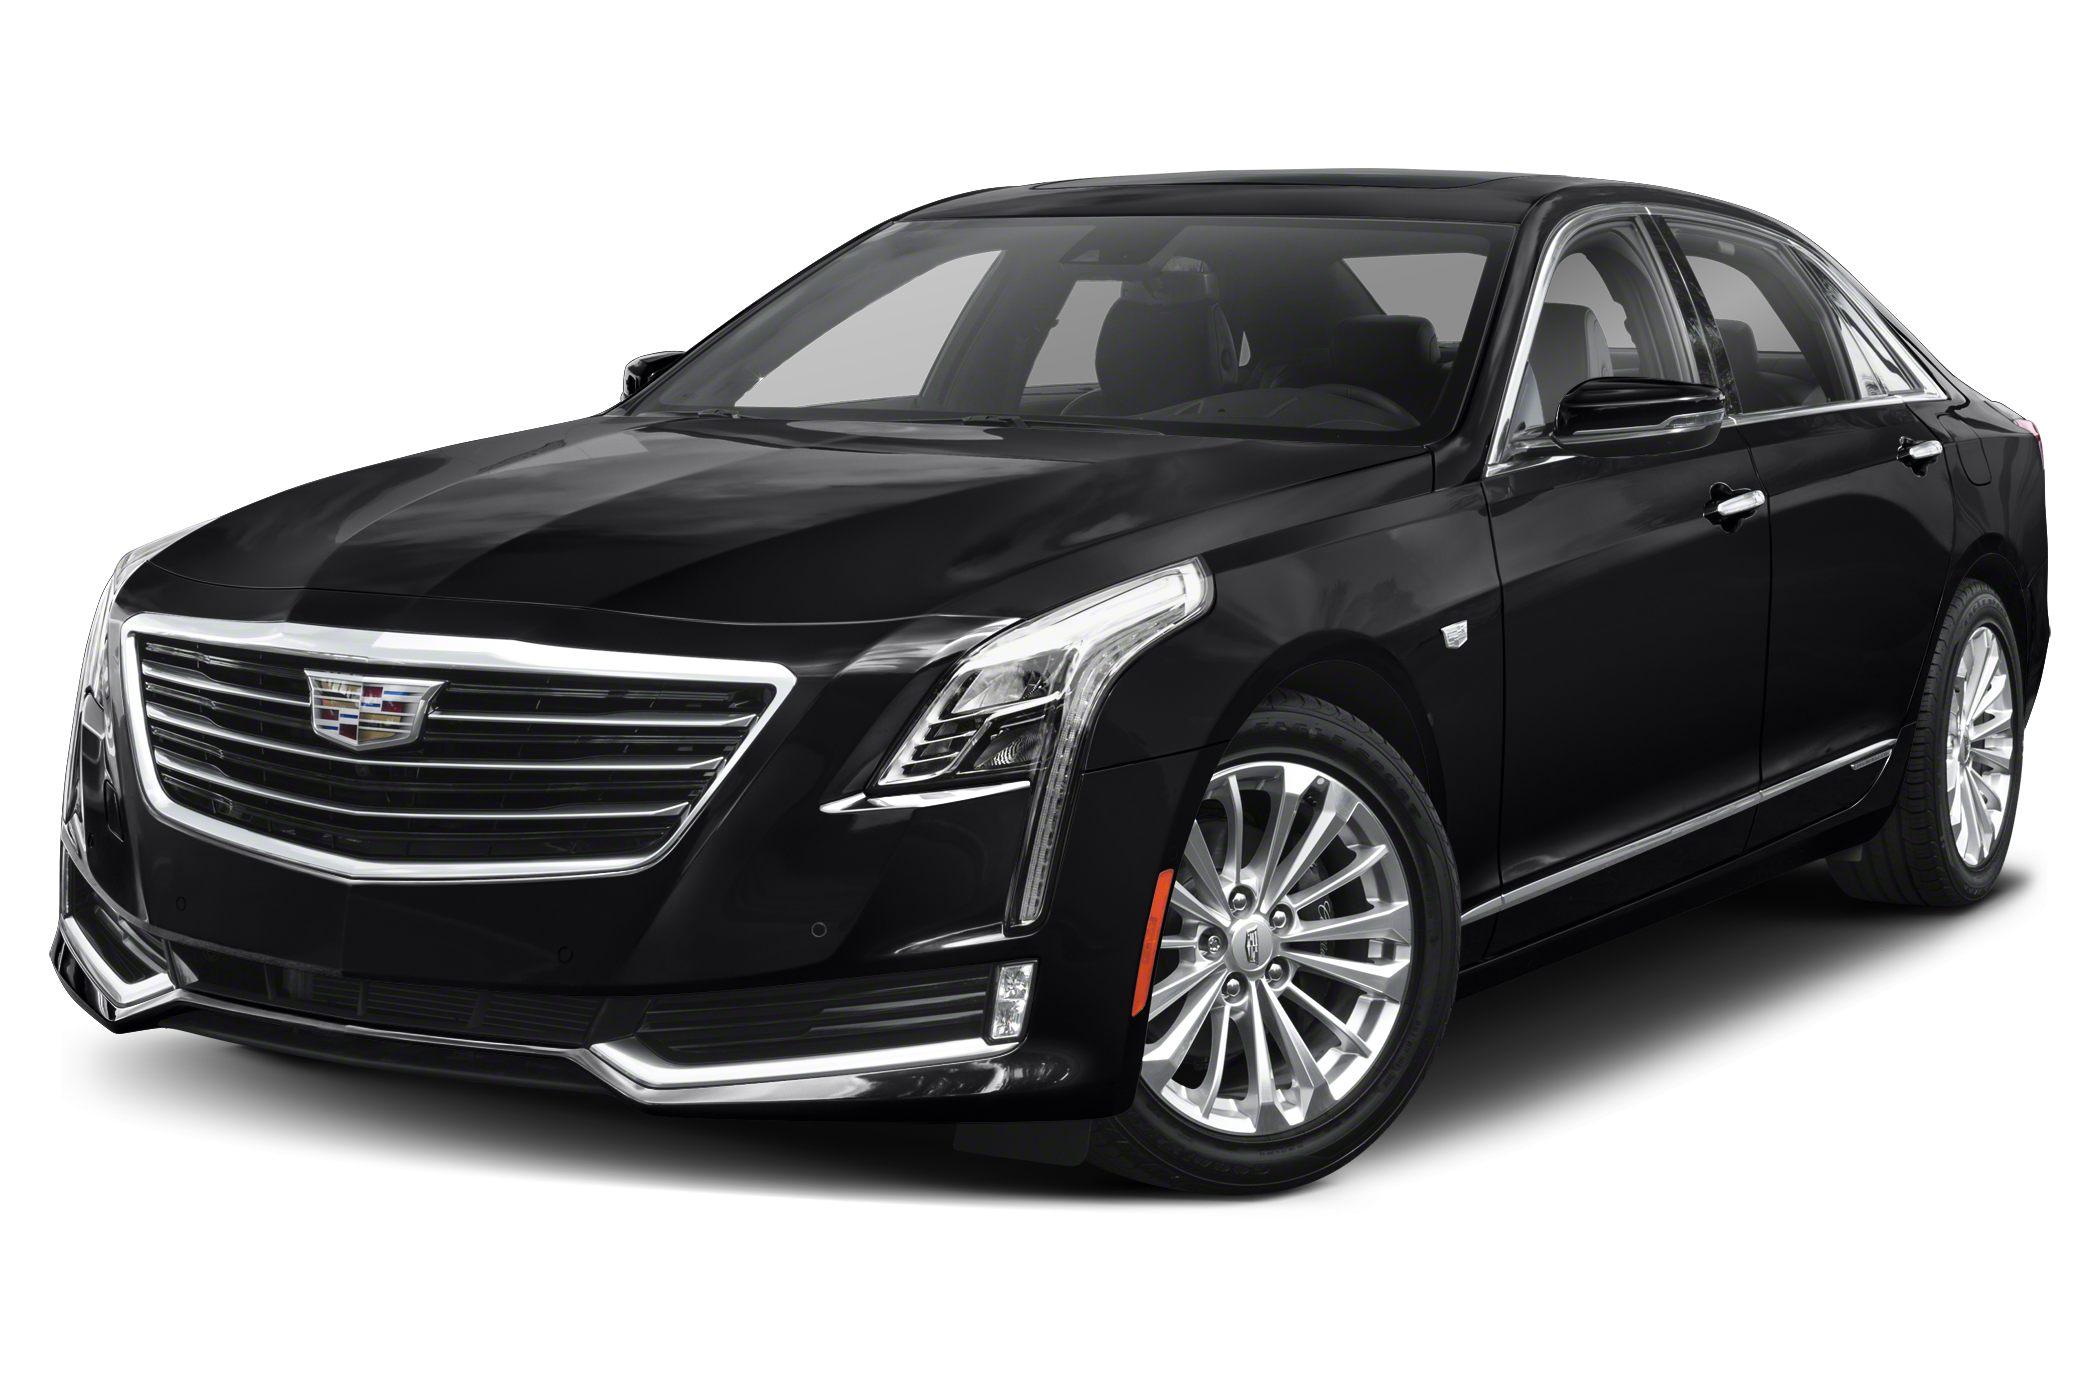 2018 Cadillac Ct6 Plug In